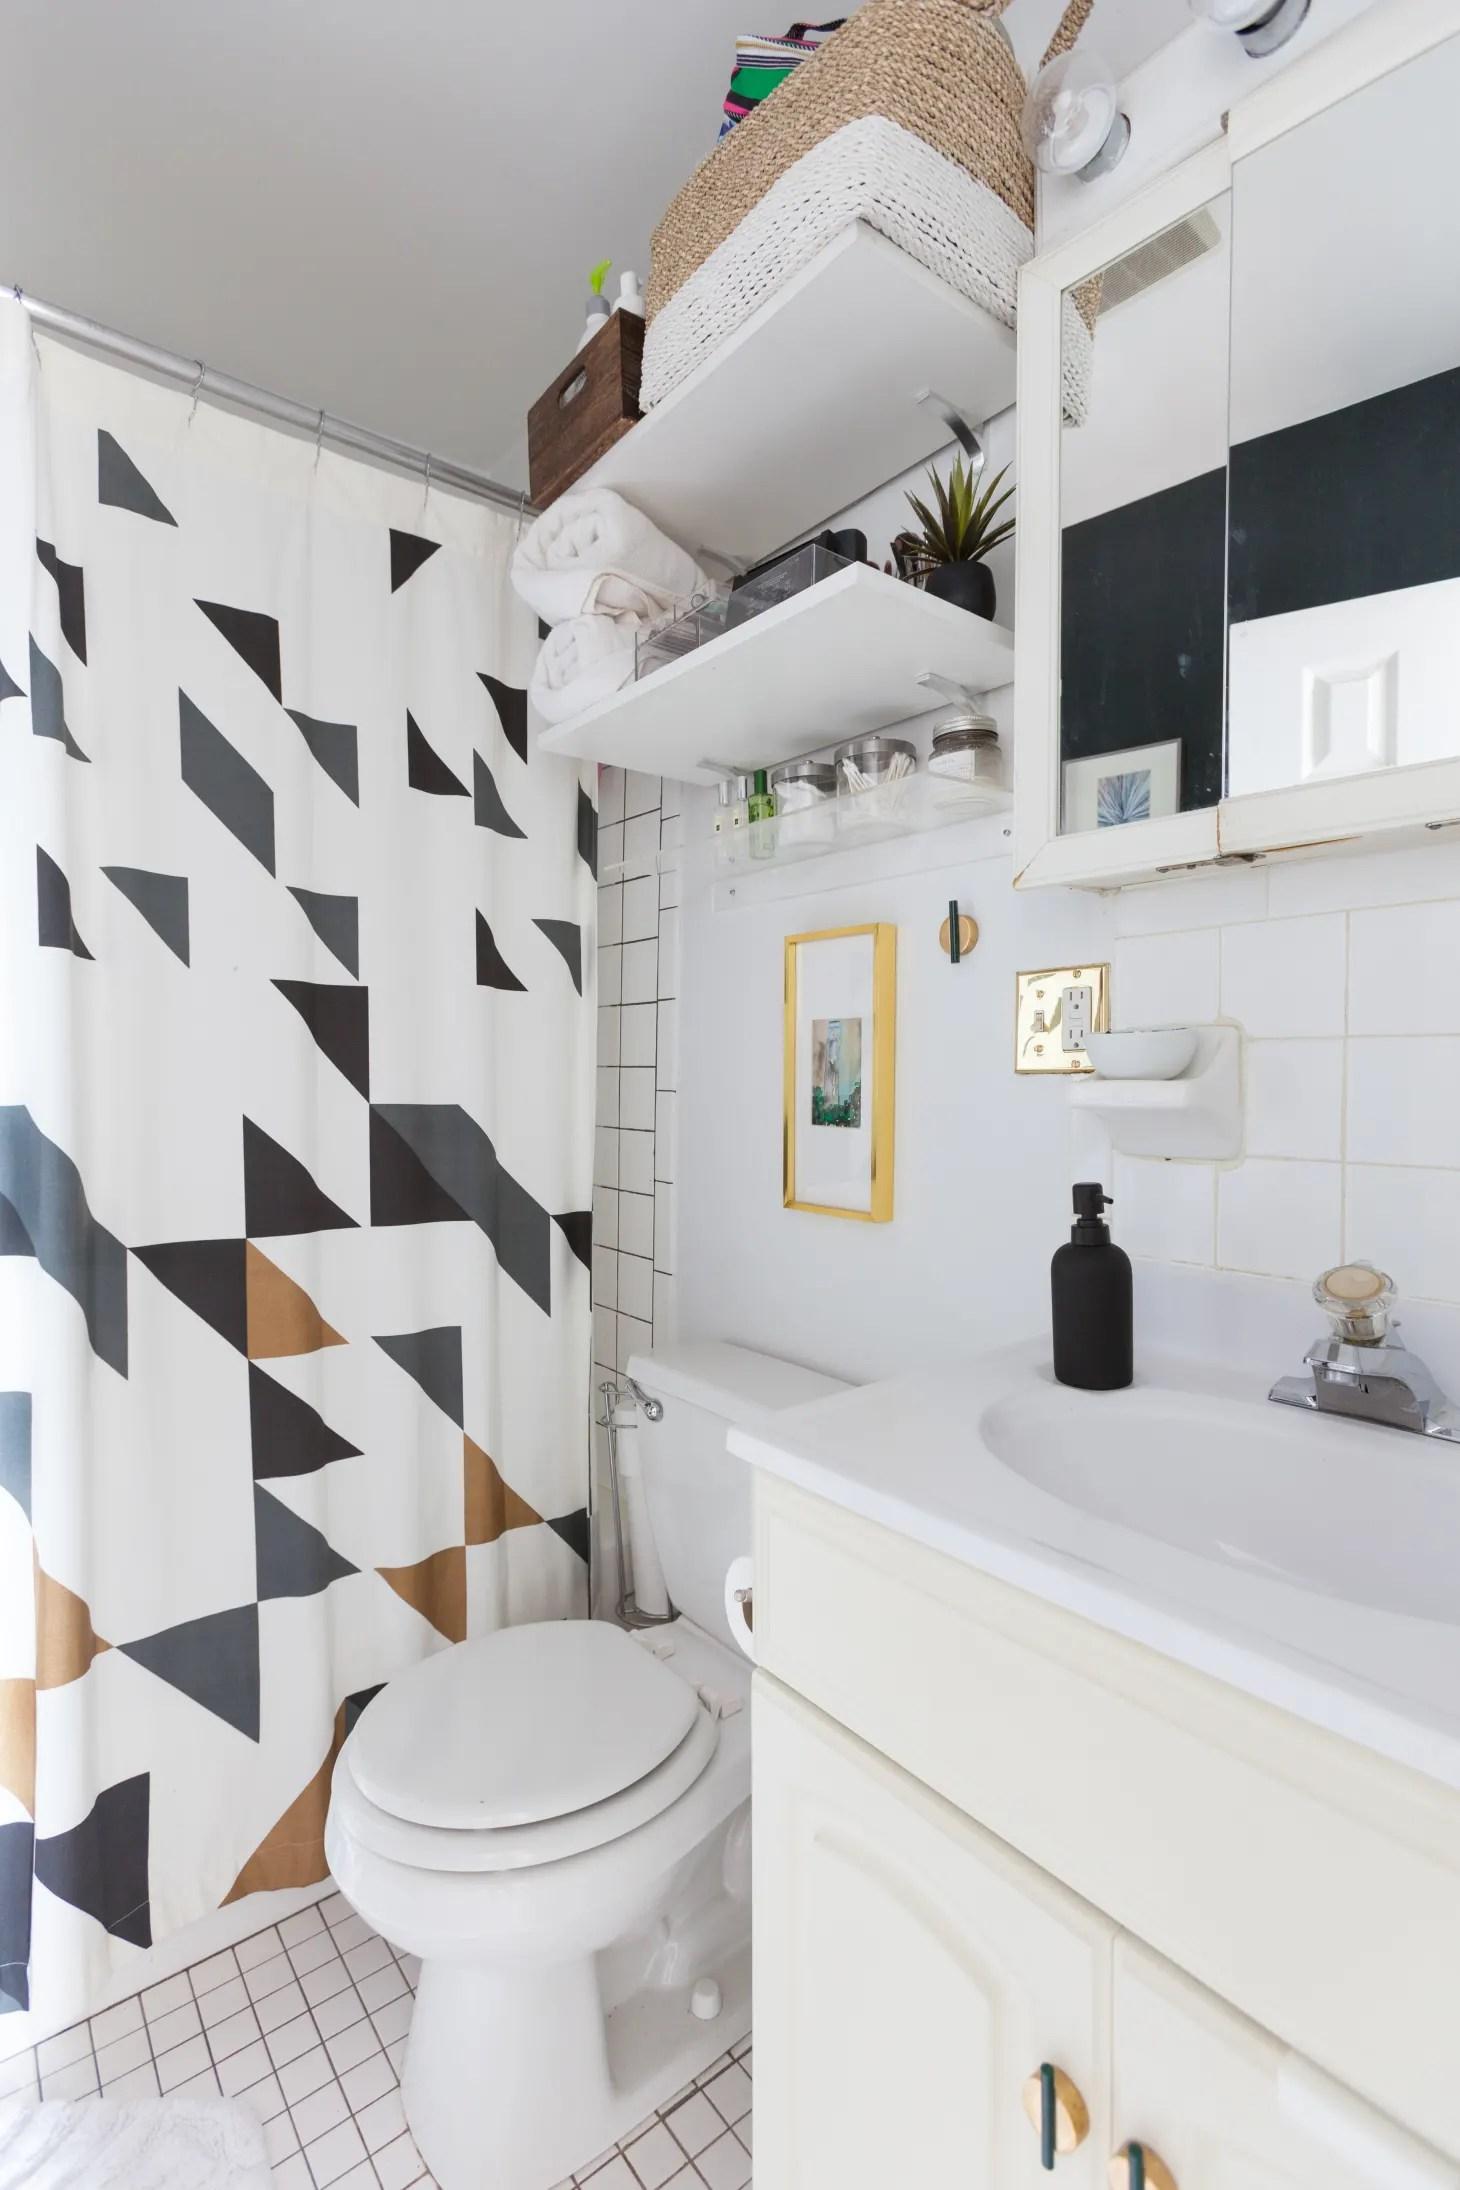 25 Small Bathroom Storage & Design Ideas - Storage ... on Small Apartment Bathroom Storage Ideas  id=42542